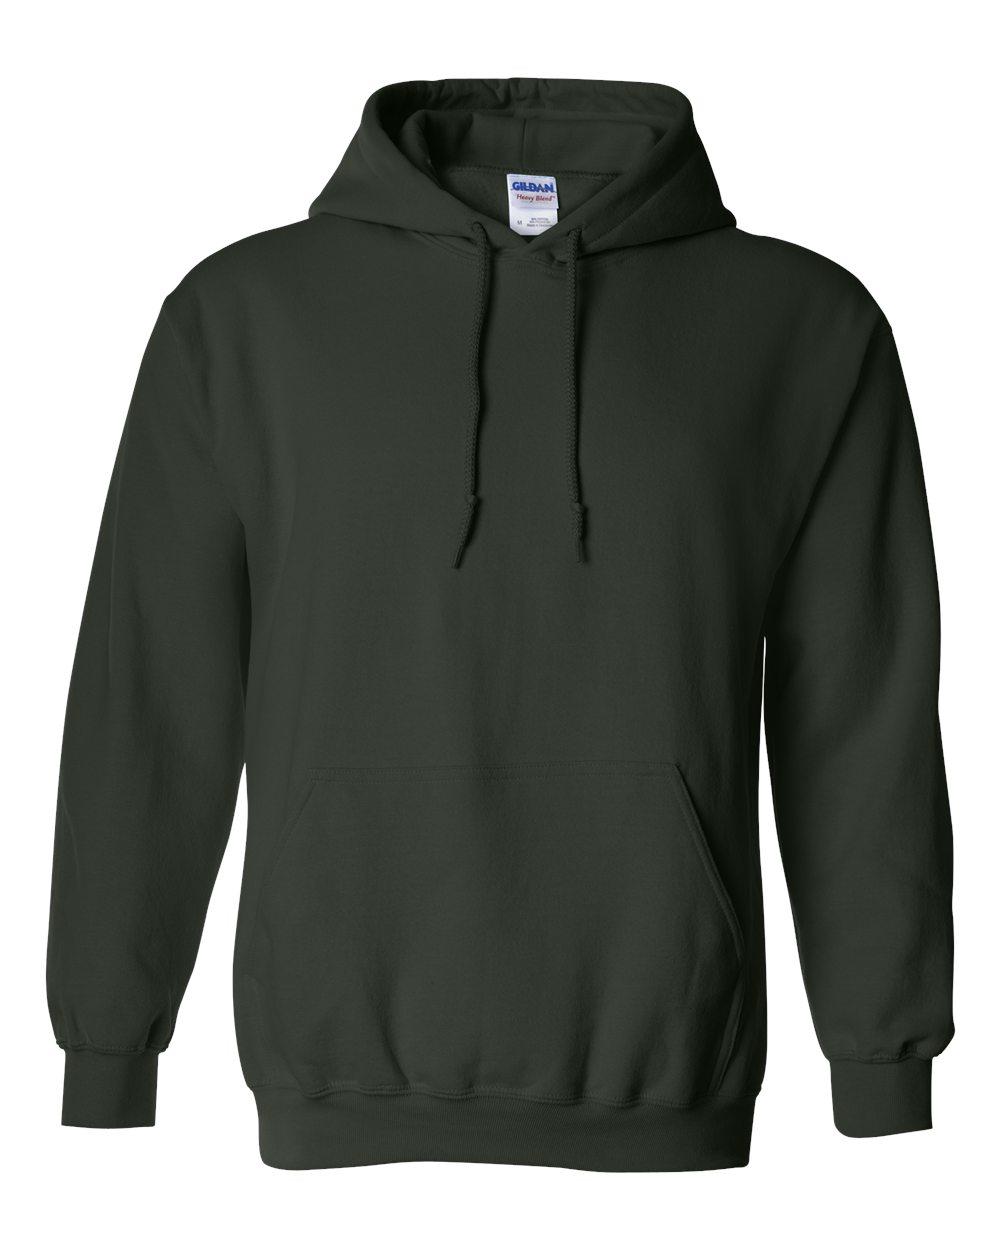 Gildan-Mens-Blank-Hoodie-Heavy-Blend-Hooded-Sweatshirt-Solid-18500-up-to-5XL thumbnail 27